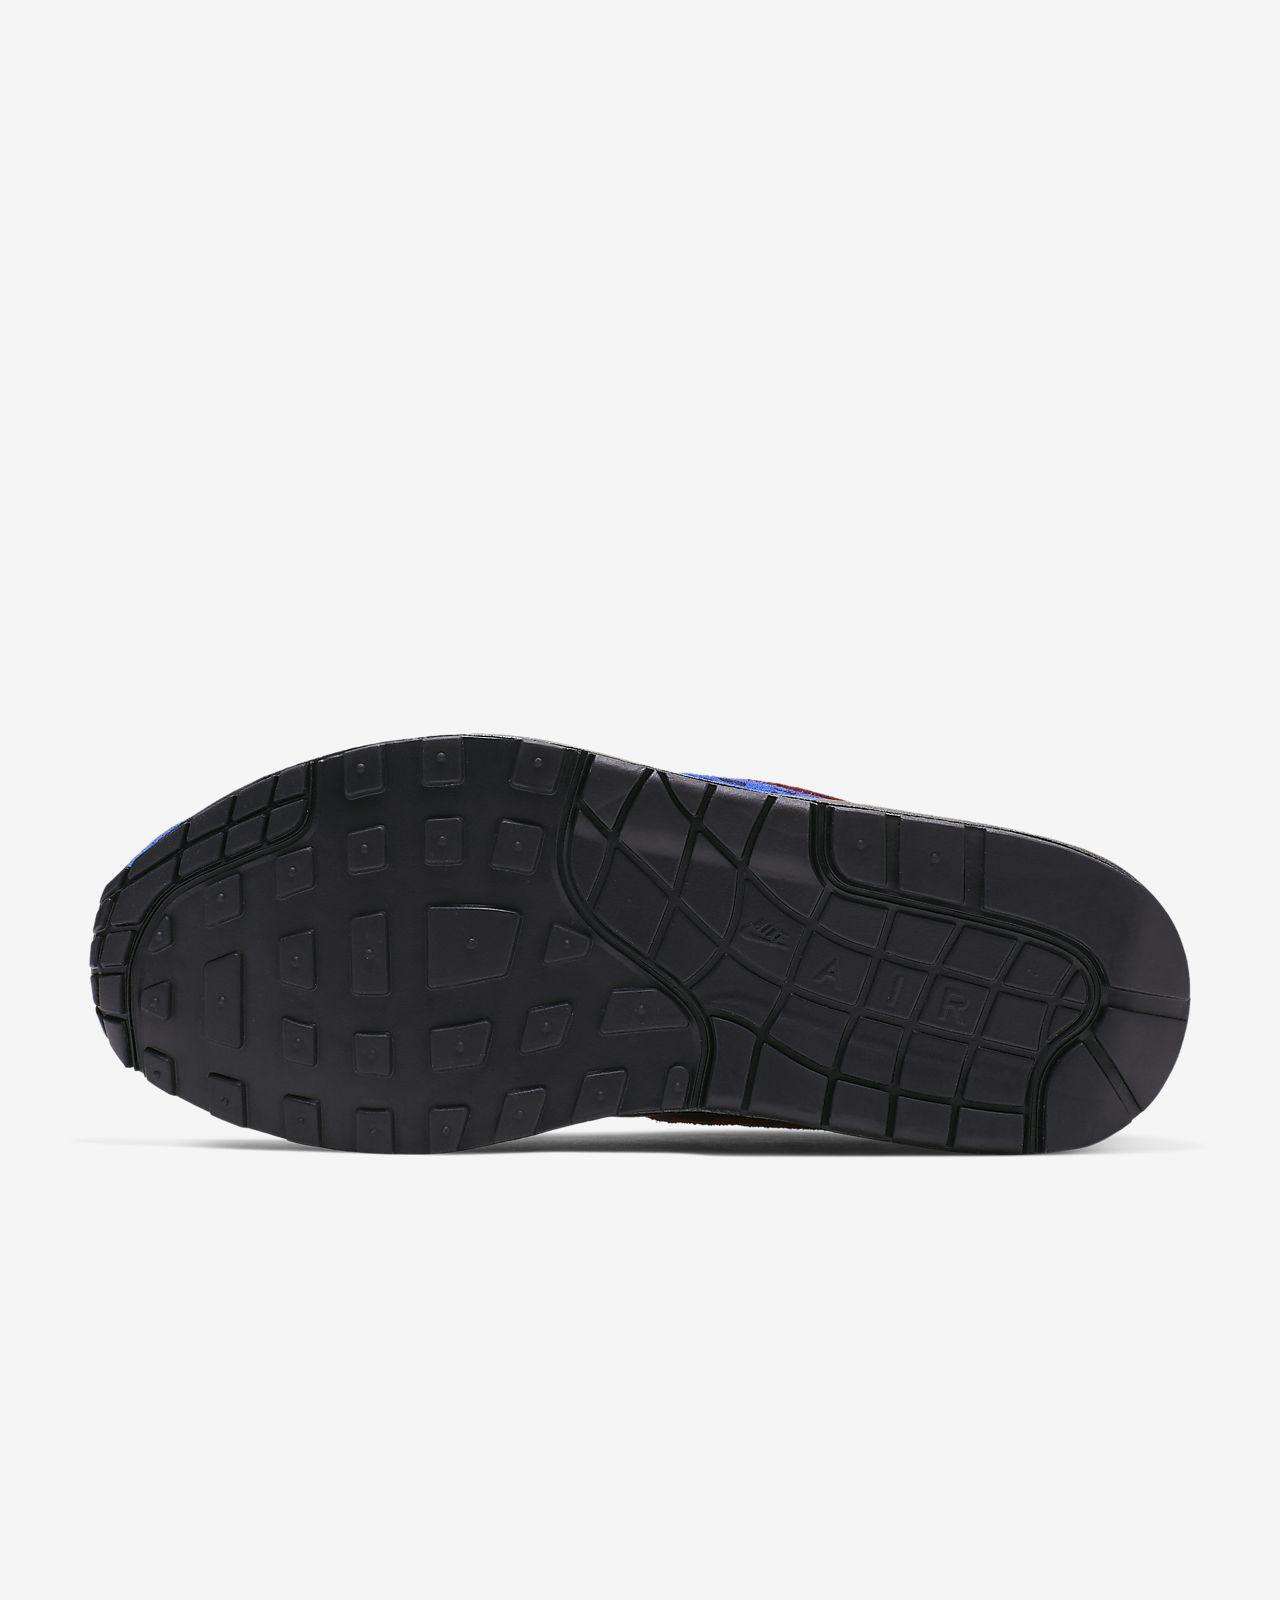 buy online b0506 f5547 ... Nike Air Max 1 Premium Animal Women s Shoe